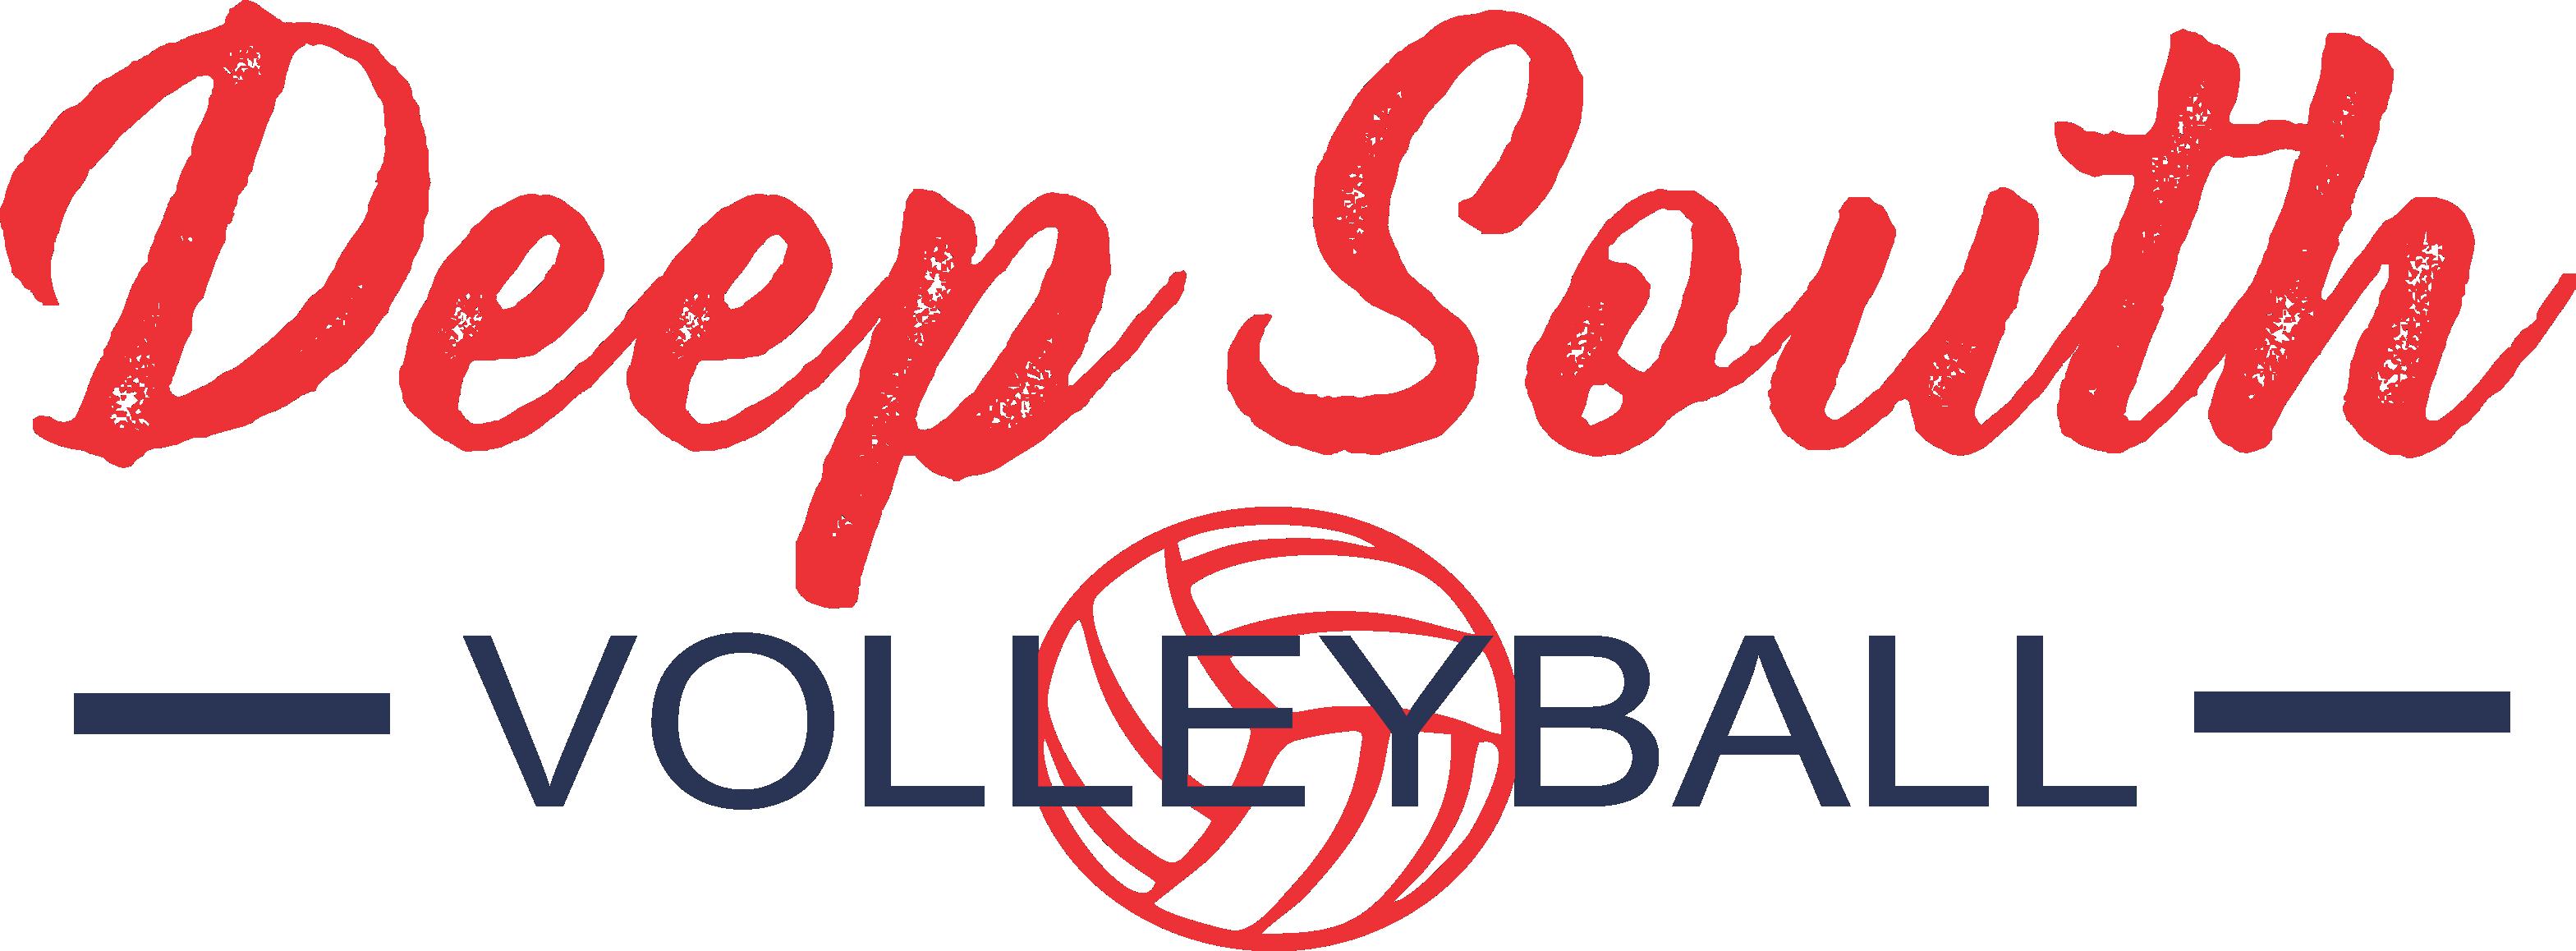 https://secureservercdn.net/198.71.233.189/c8i.092.myftpupload.com/wp-content/uploads/2020/02/Deep-South-new-logo.png